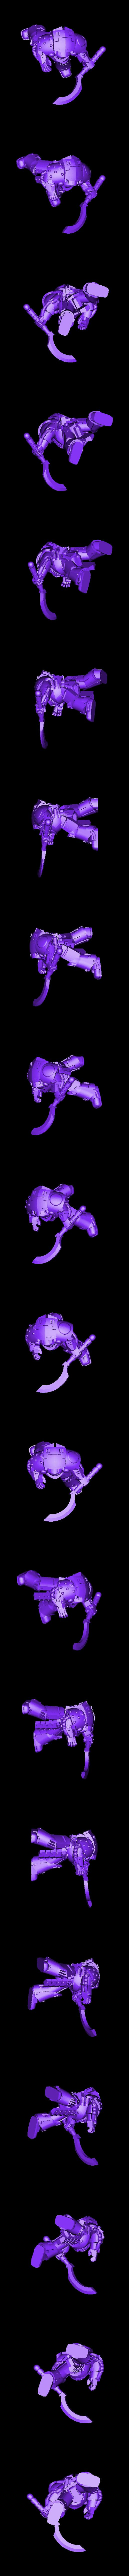 Dabinator_With_Khopesh.stl Download free STL file Dabinator With Khopesh Power Sword • 3D print template, Mazer